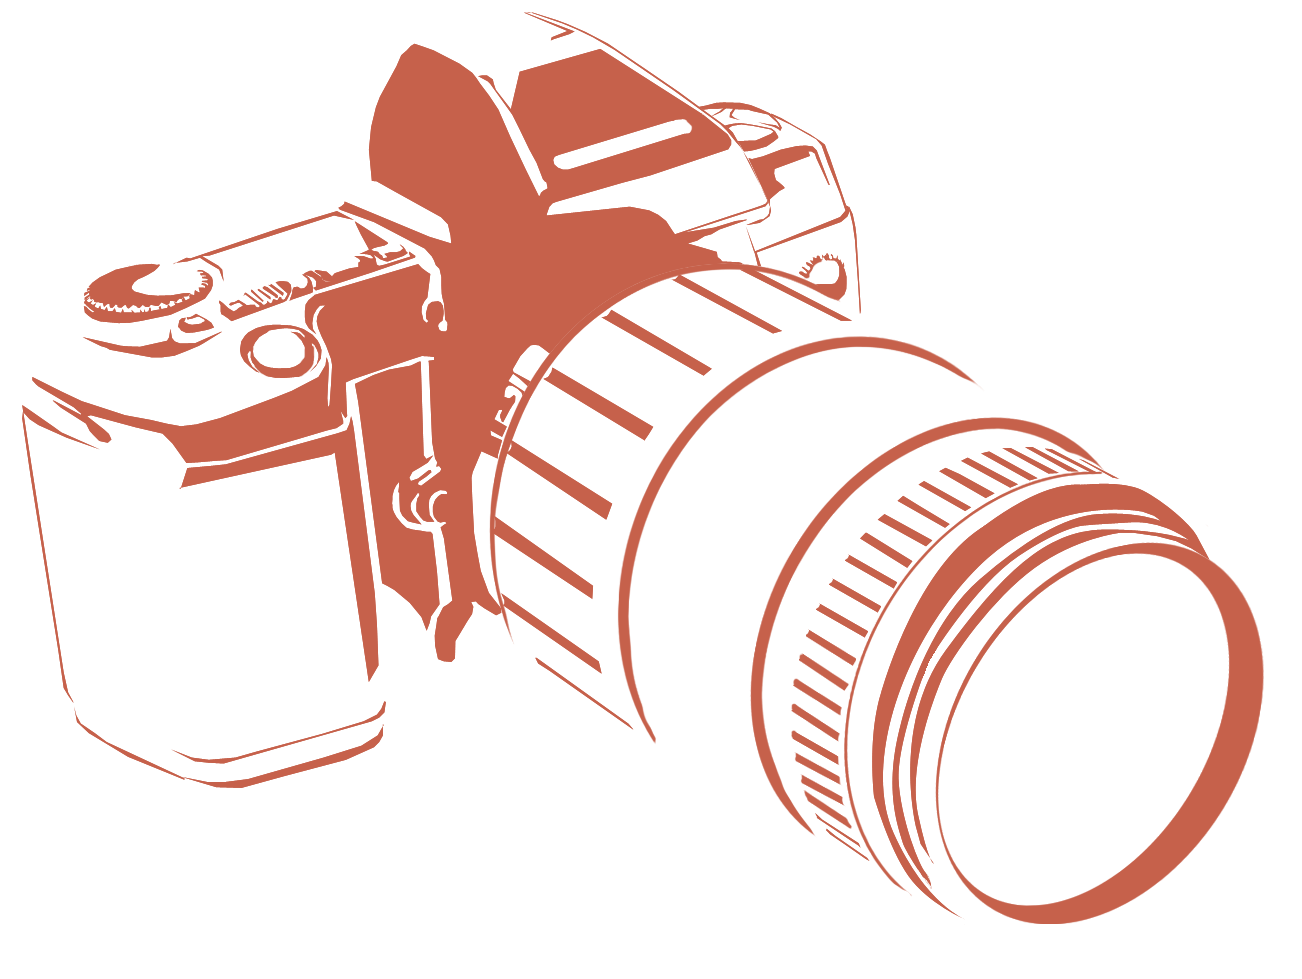 Png images transparent free. Photographer clipart photographer studio